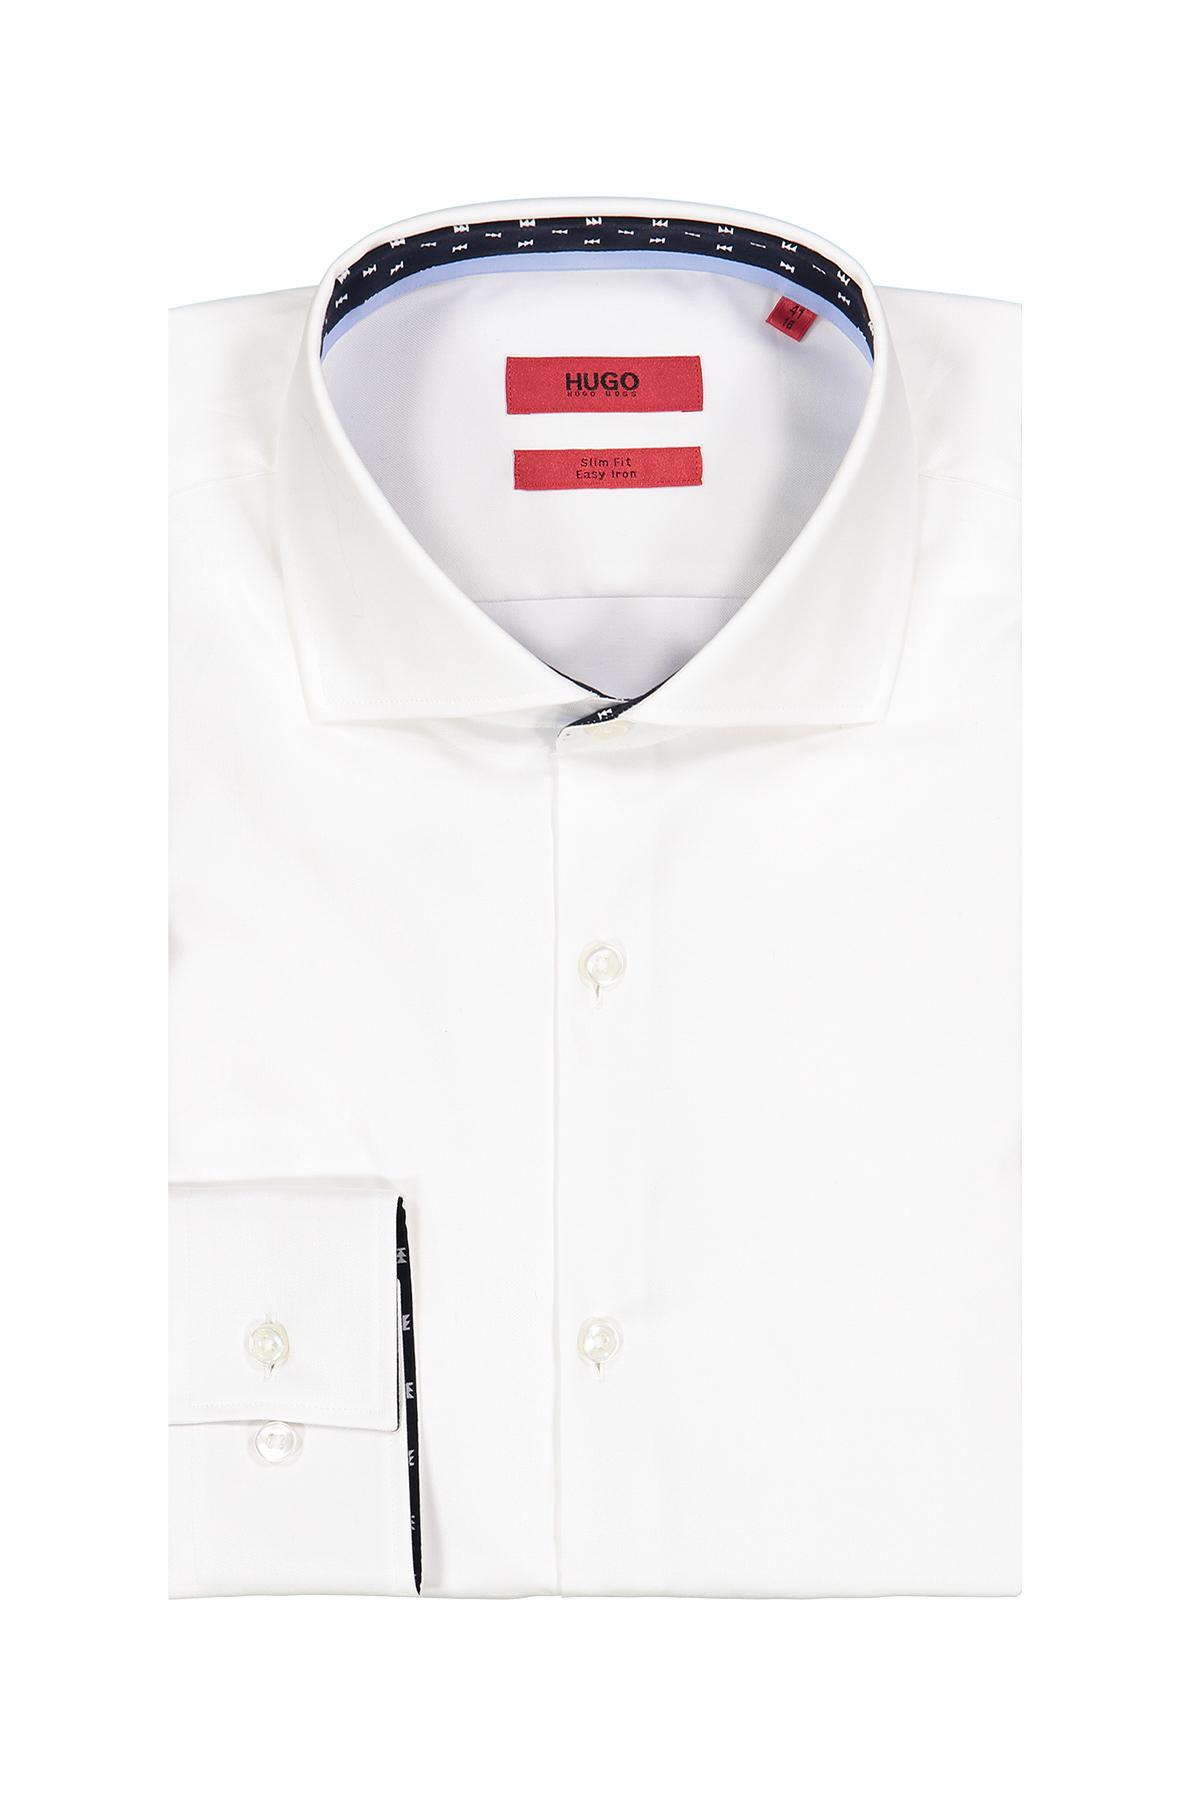 Camisa Hugo Boss, Easy Iron, slim fit, lisa blanca, cuello italiano.